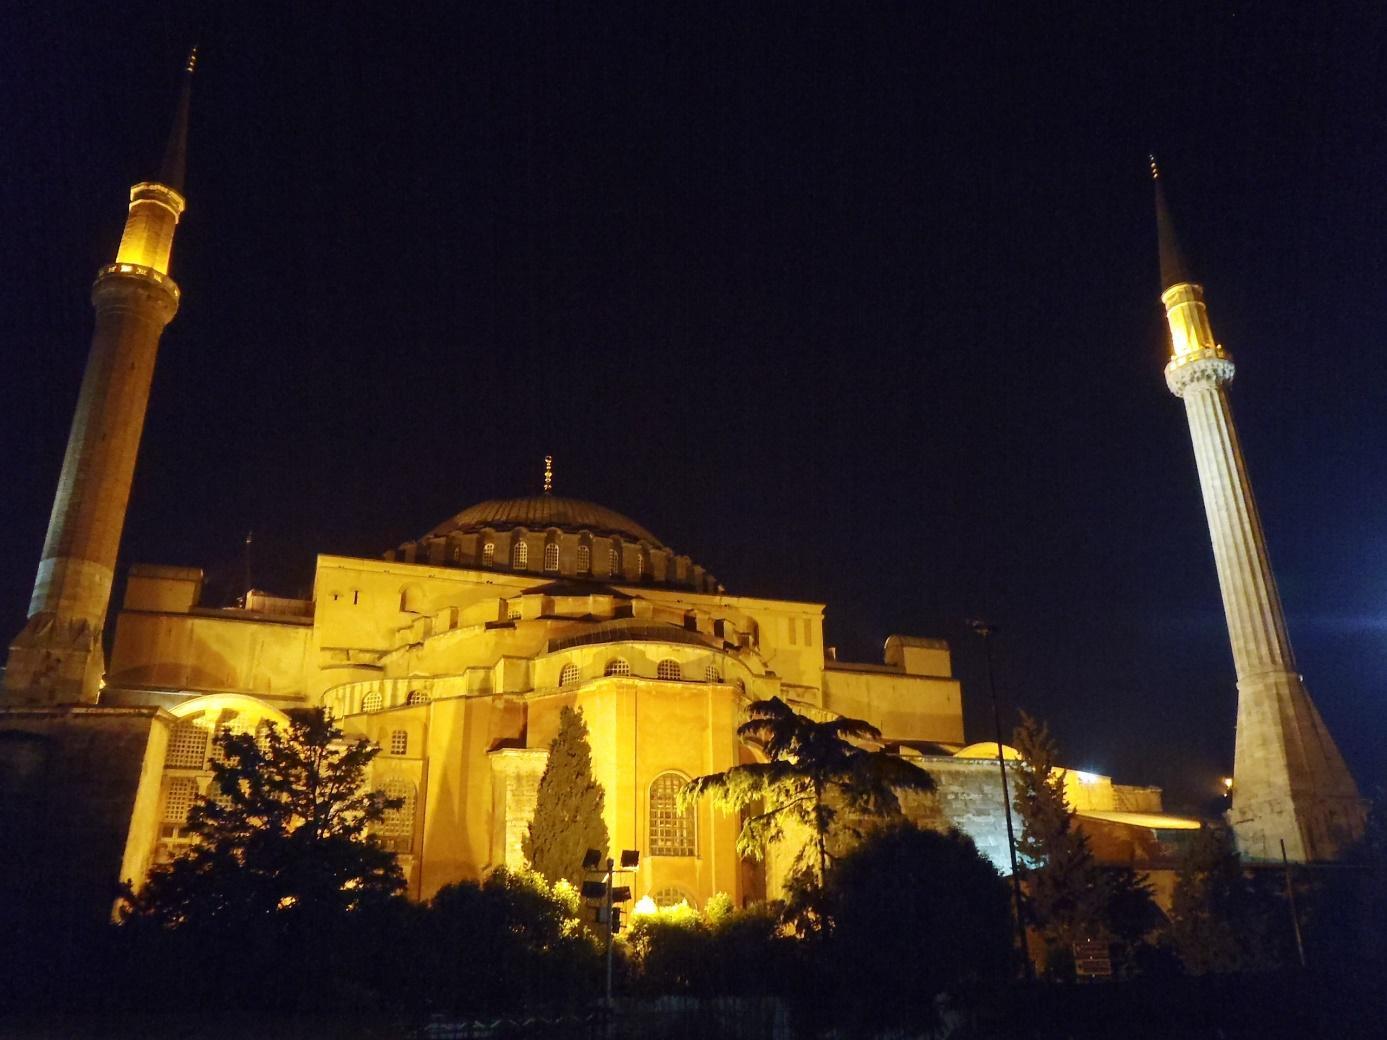 C:\Users\Administrator\Documents\Documents\Putovanja\PUTOPISI\TURSKA\1\Slike\6.jpg